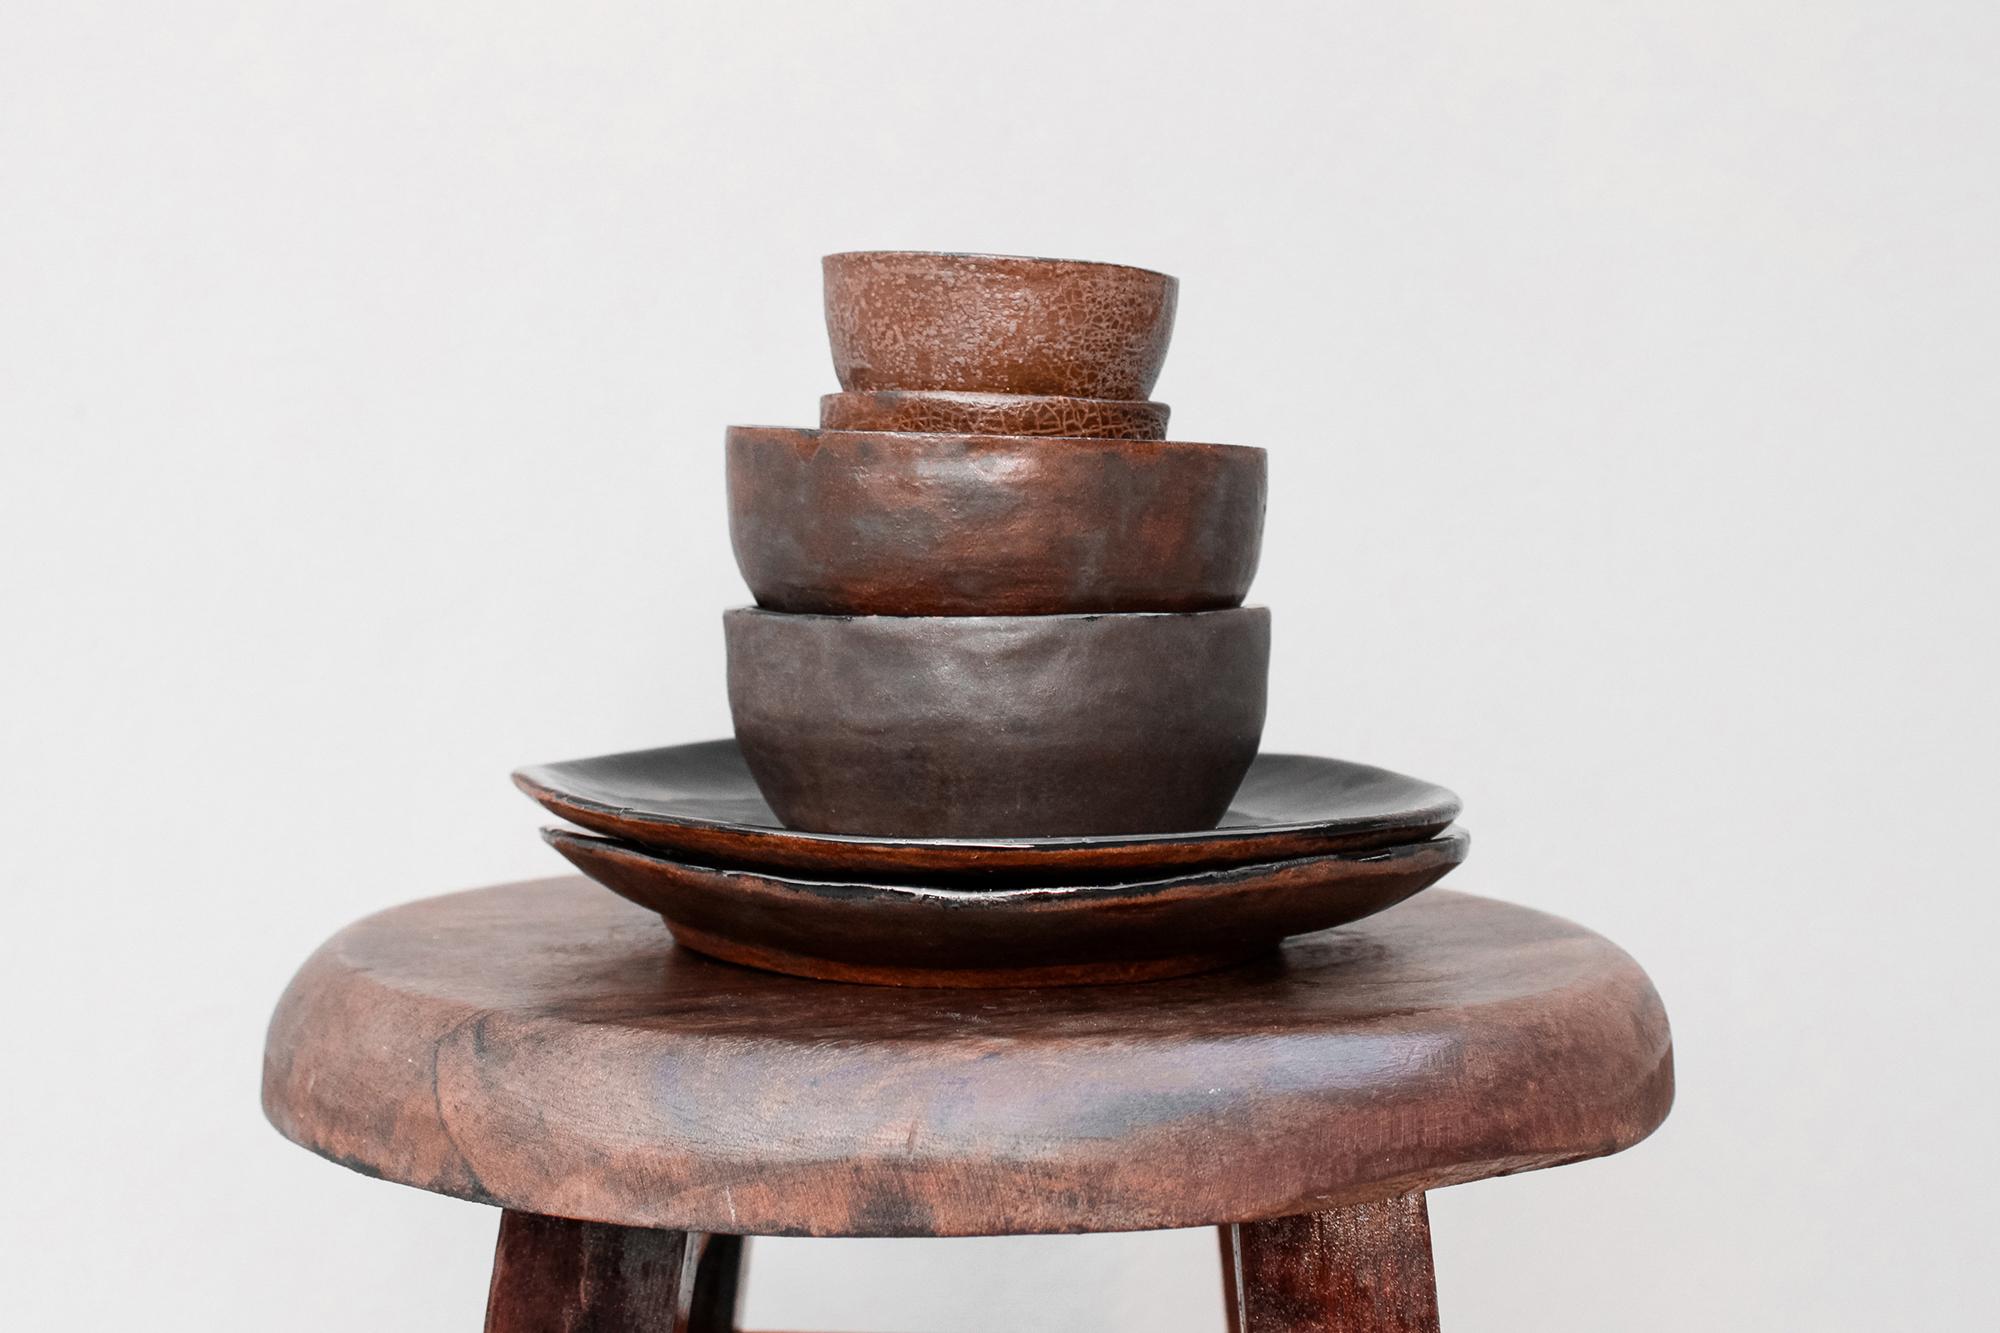 Cerâmica artesanal, qual sua  real importância?